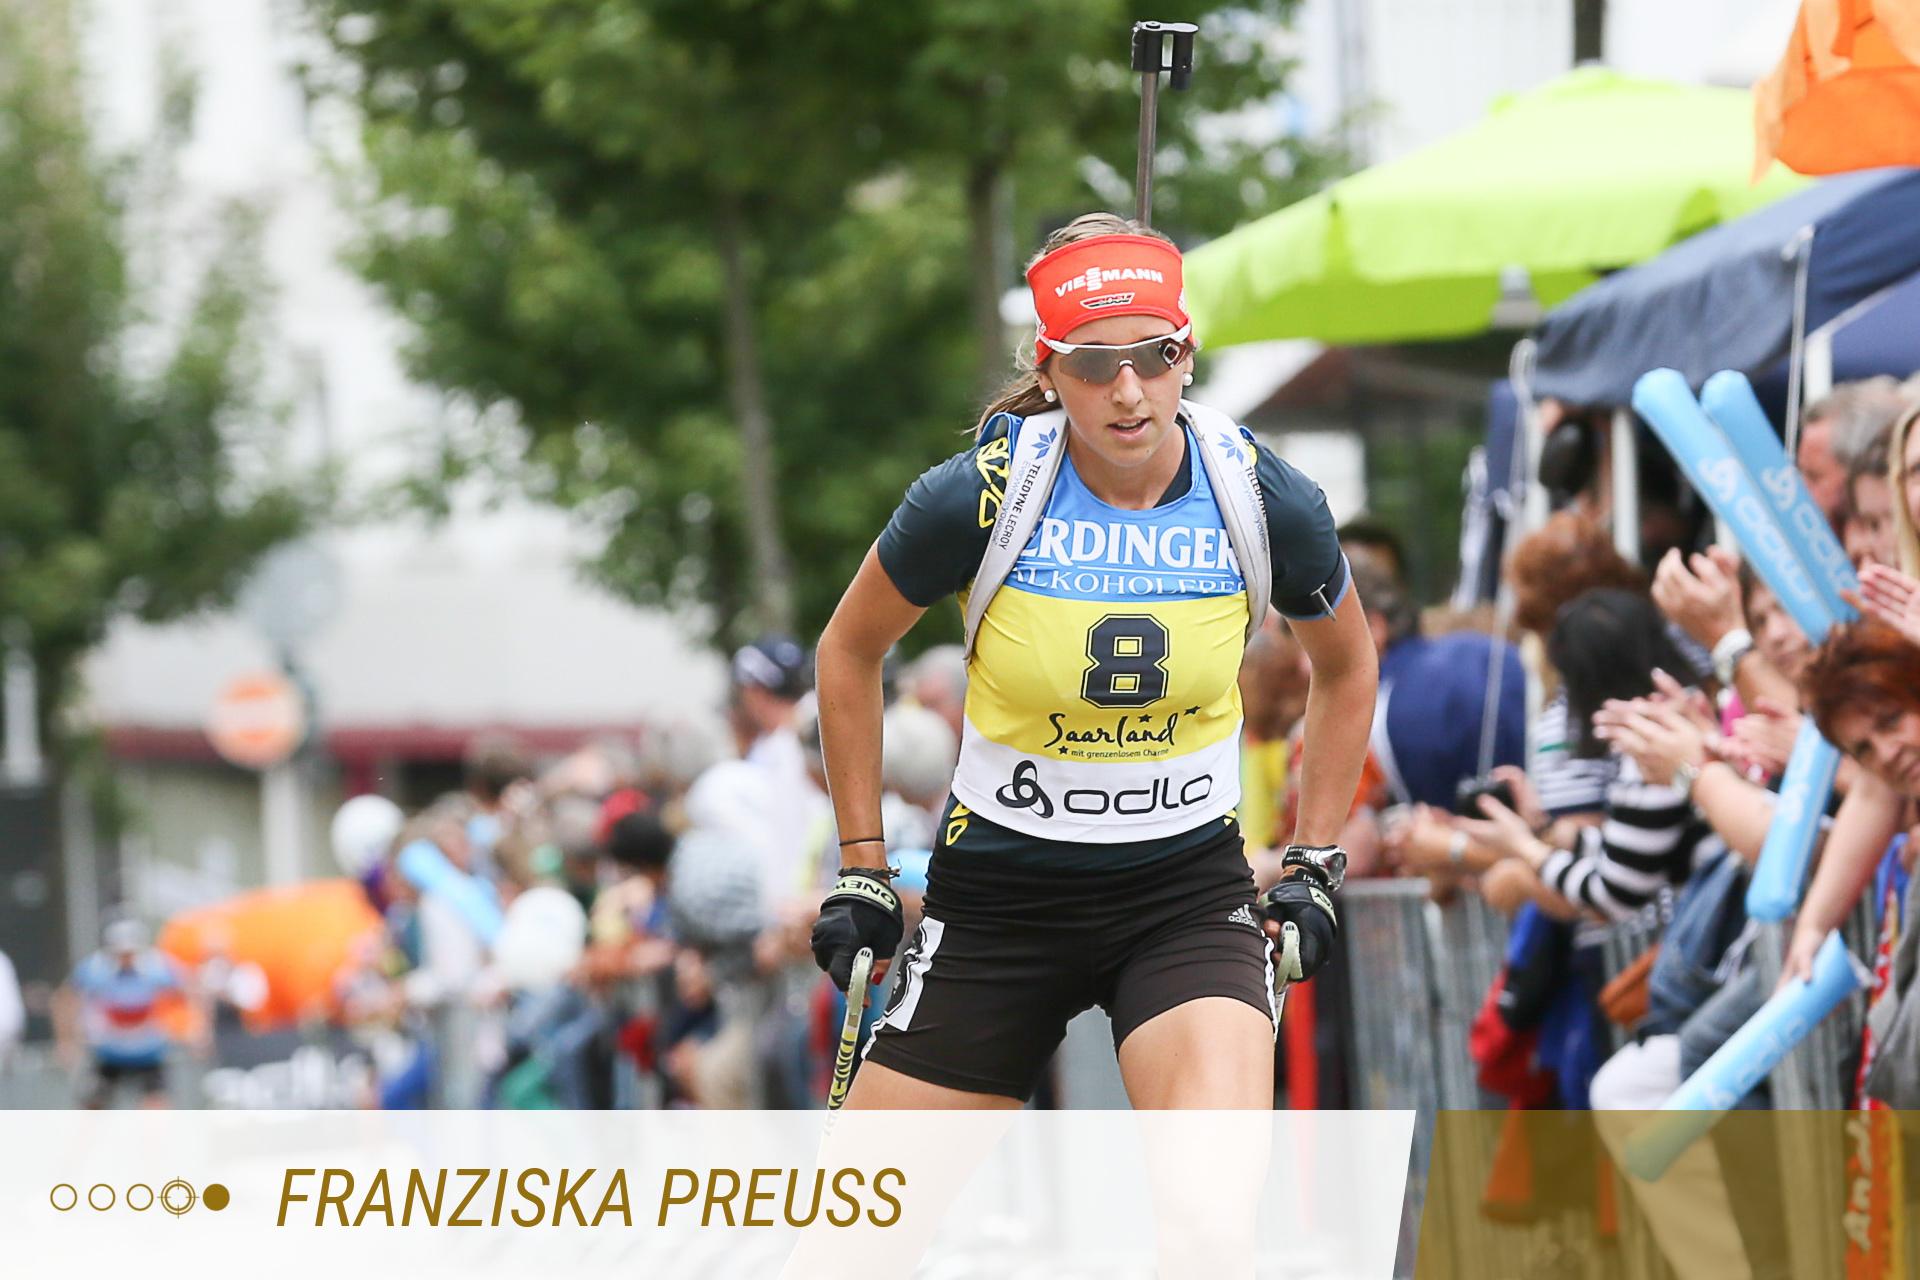 Athleten_FranziskaPreuss